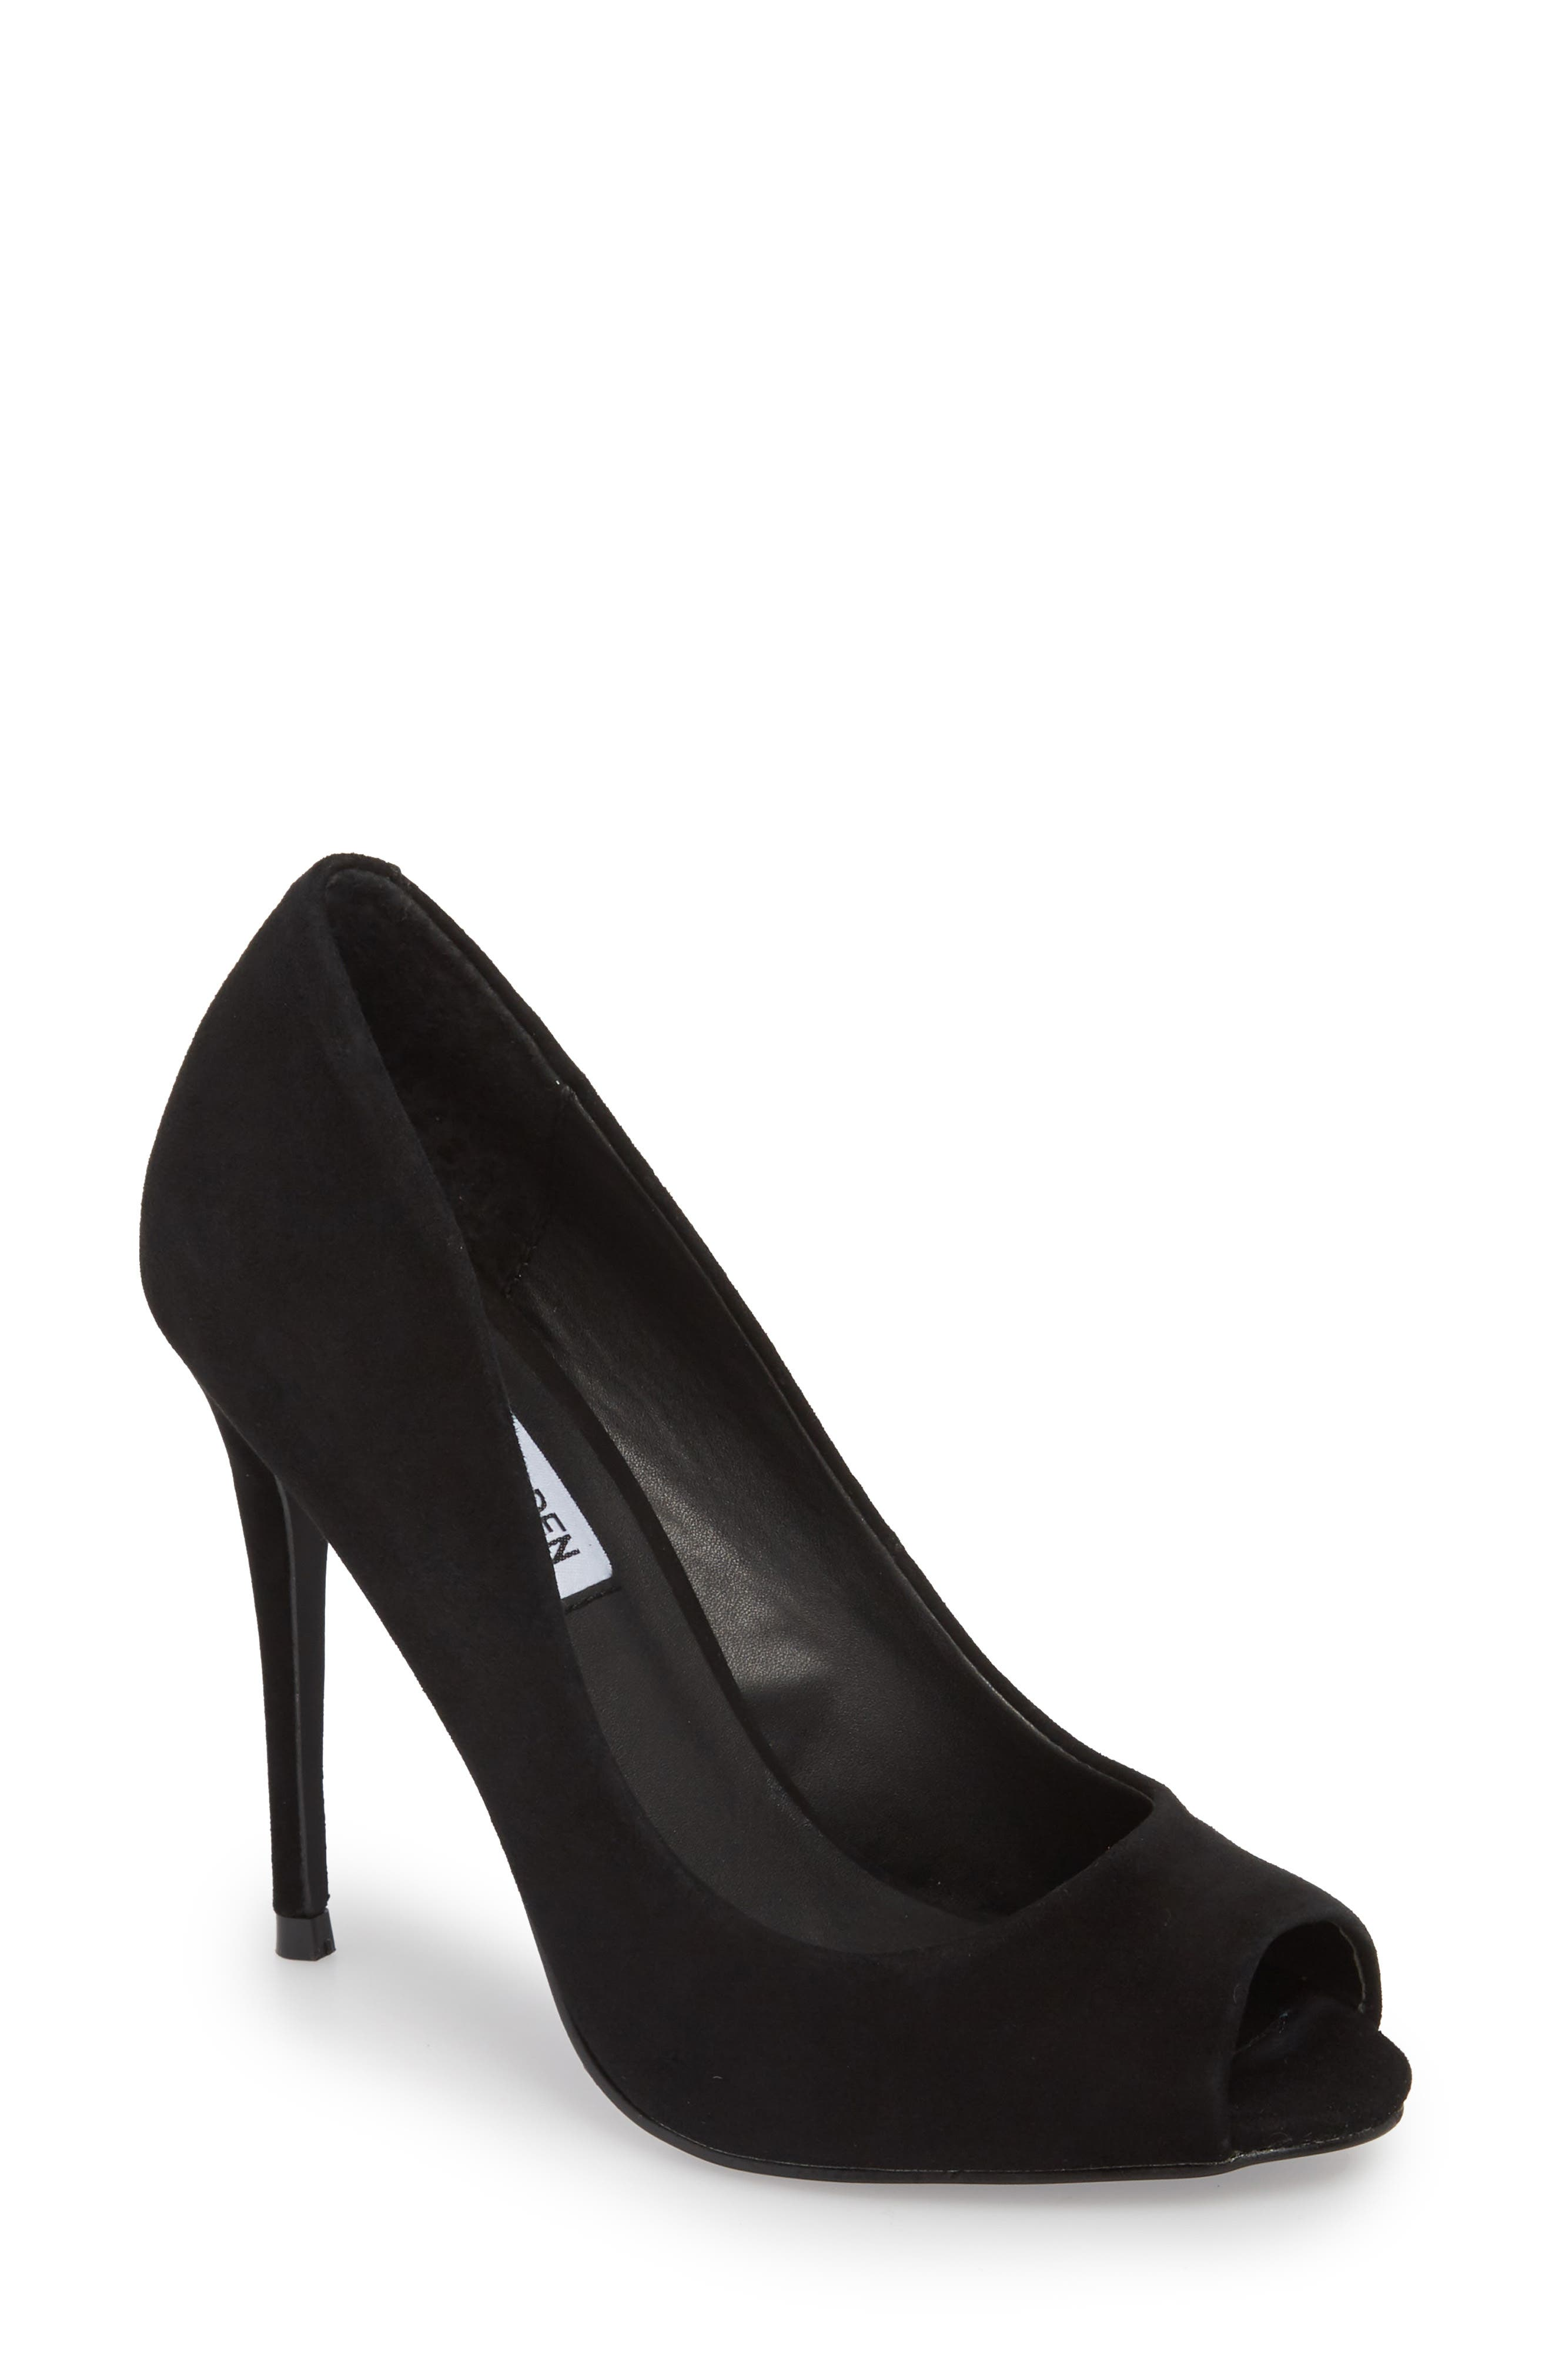 Diane Peep Toe Pump,                         Main,                         color, Black Suede